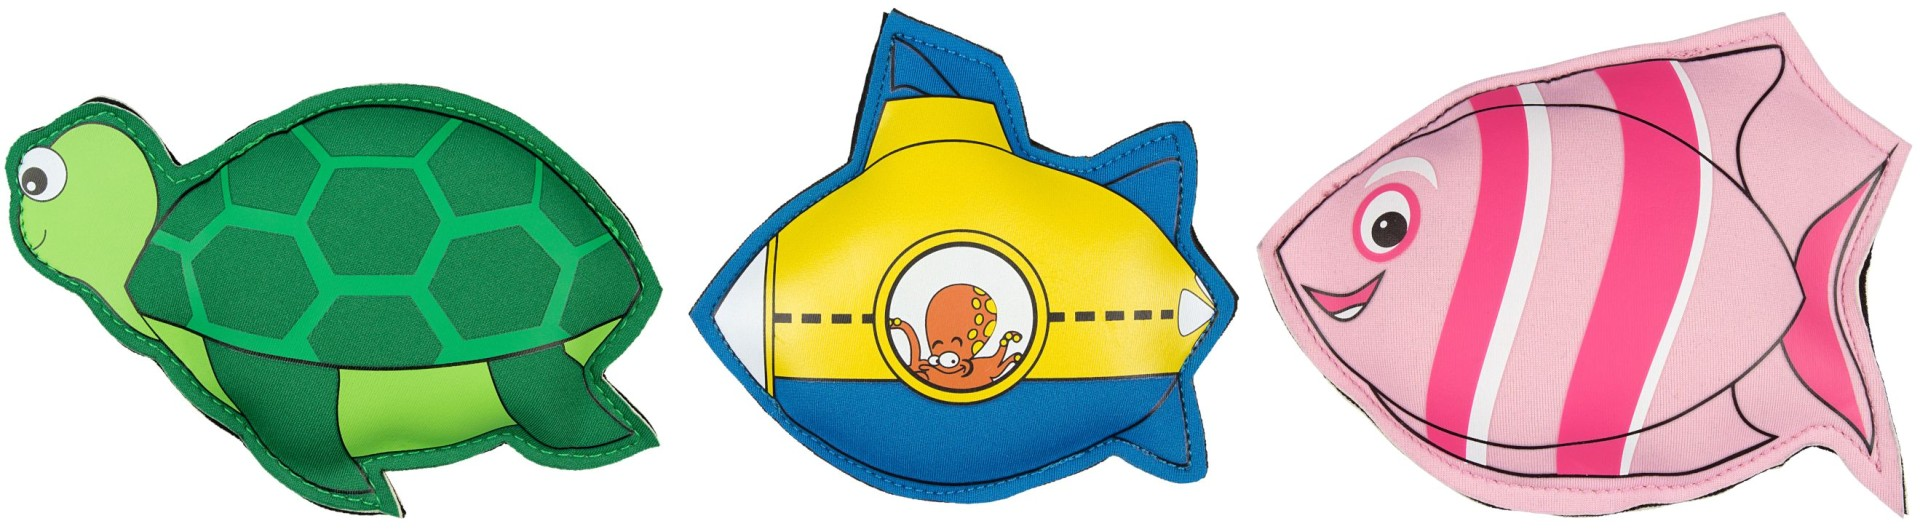 Hračky pro potápění Waimea Dive Animals sada 3ks